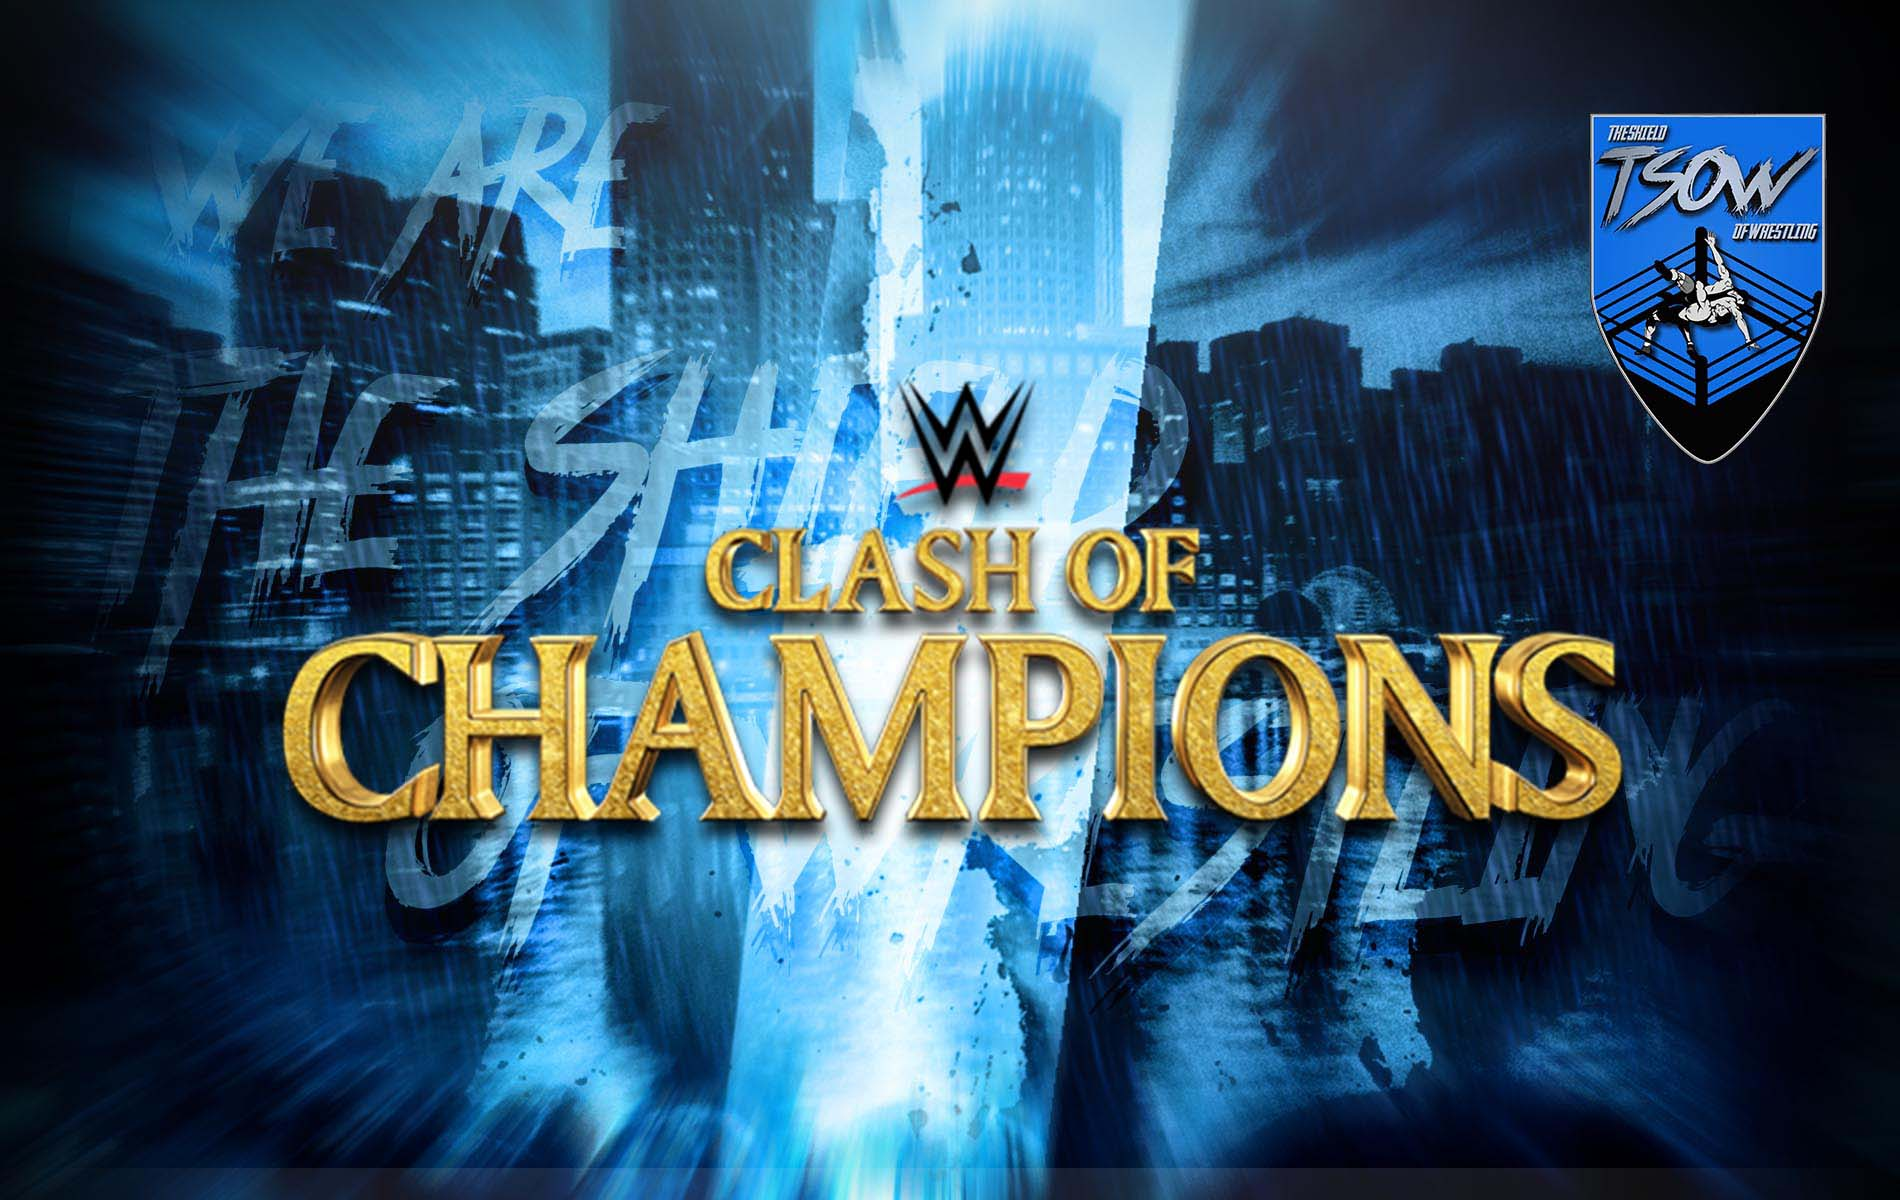 Clash of Champions 2020: Jimmy Uso torna nel Main Event